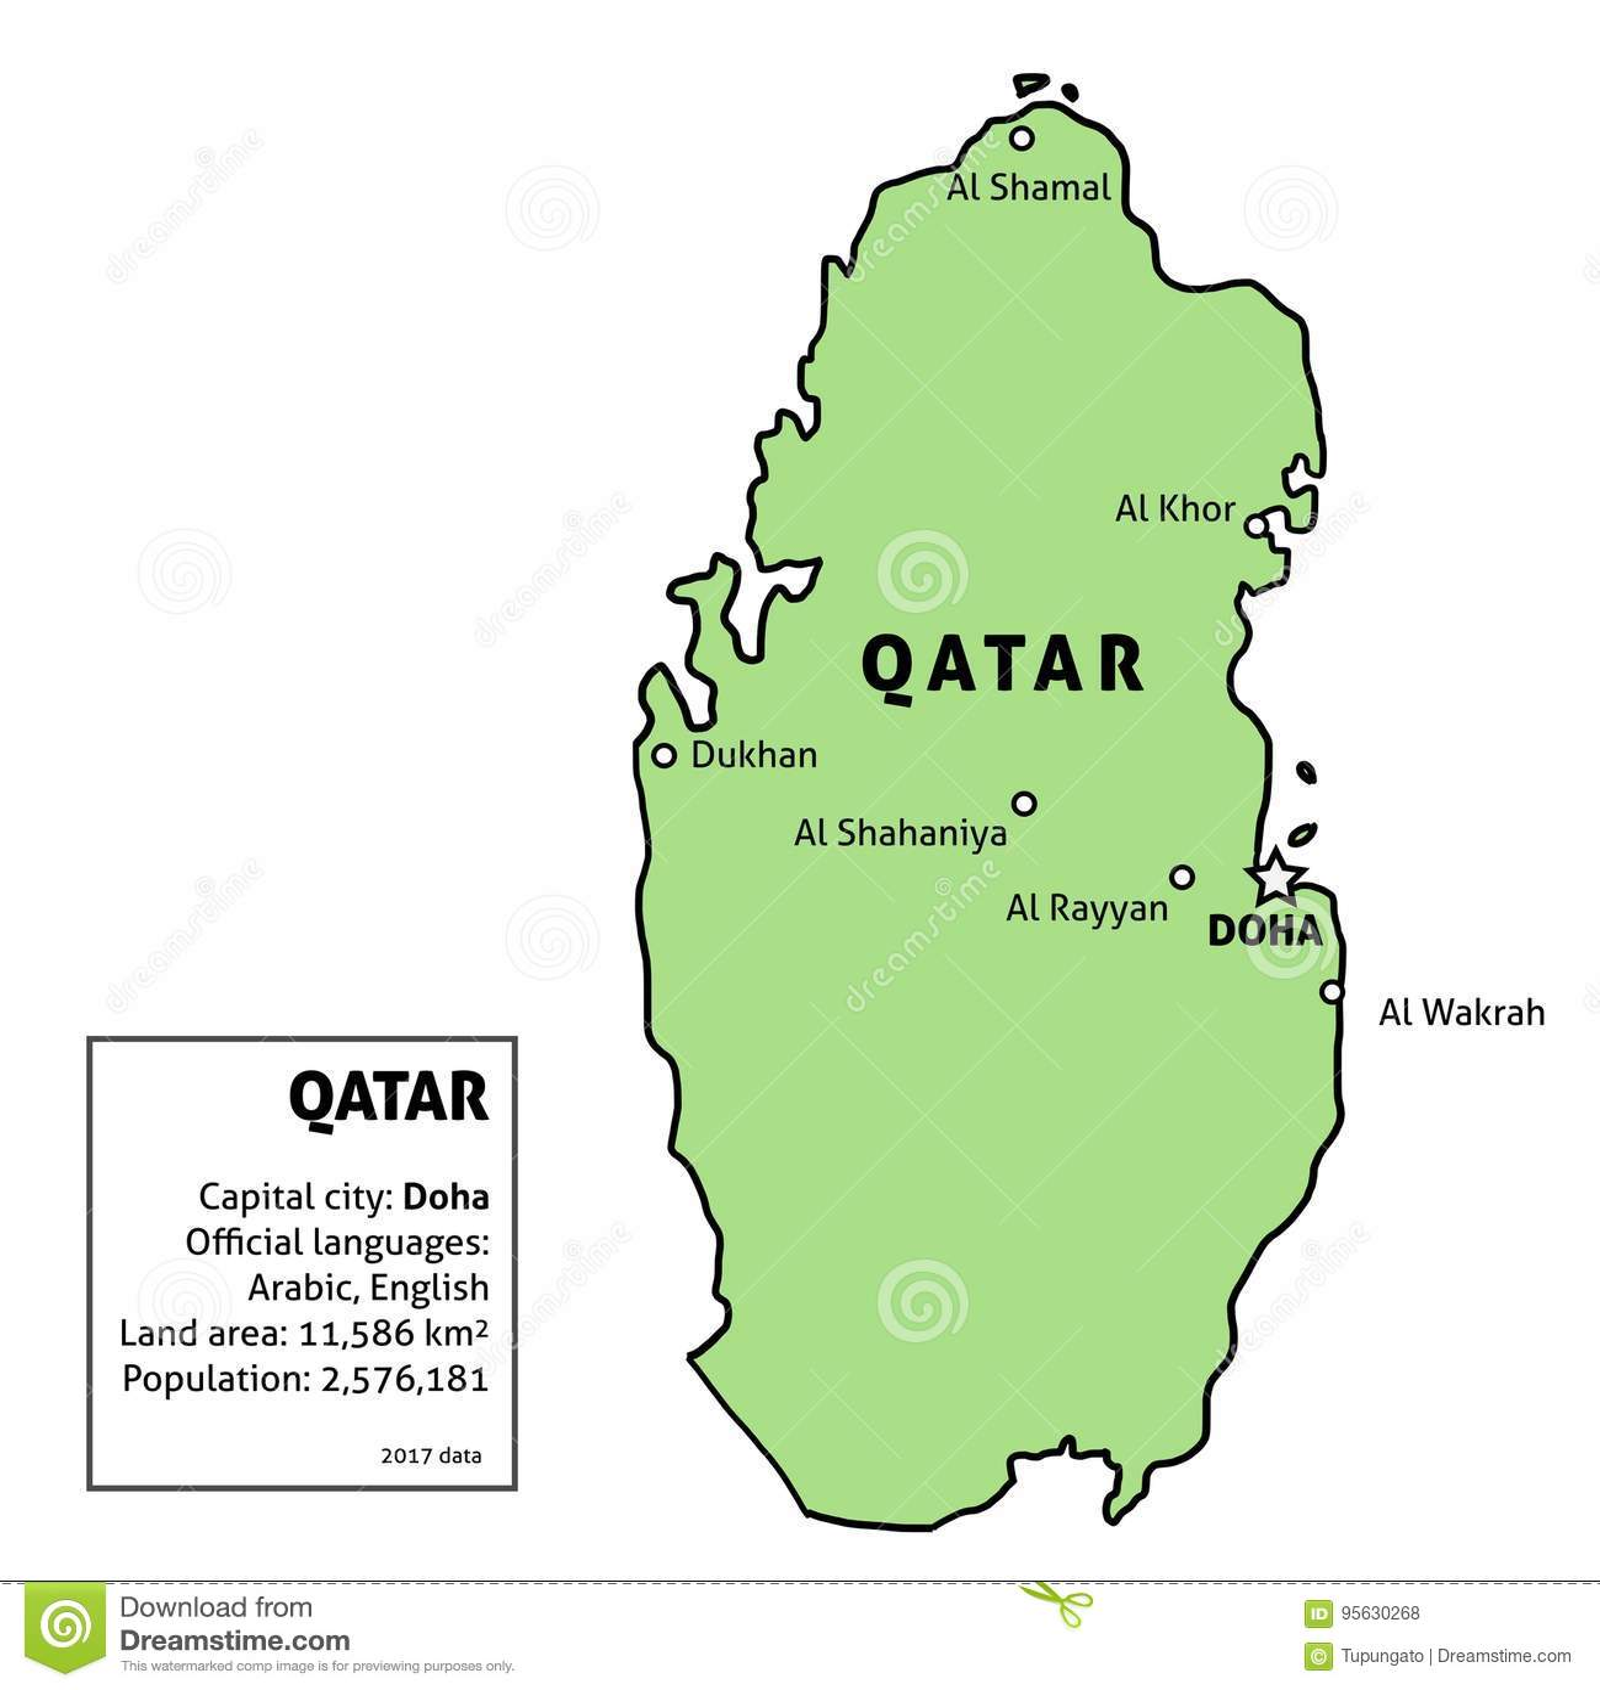 Map of Qatar stock vector. Illustration of state, data ... Qatar Area Map on italy map area, algeria map area, cape verde map area, jamaica map area, bangladesh map area, kuwait map area, lebanon map area, puerto rico map area, palestine map area, egypt map area, rwanda map area, syria map area, middle east map area, iceland map area, haiti map area, japan map area, albania map area, asia map area, cayman islands map area, saudi arabia map area,